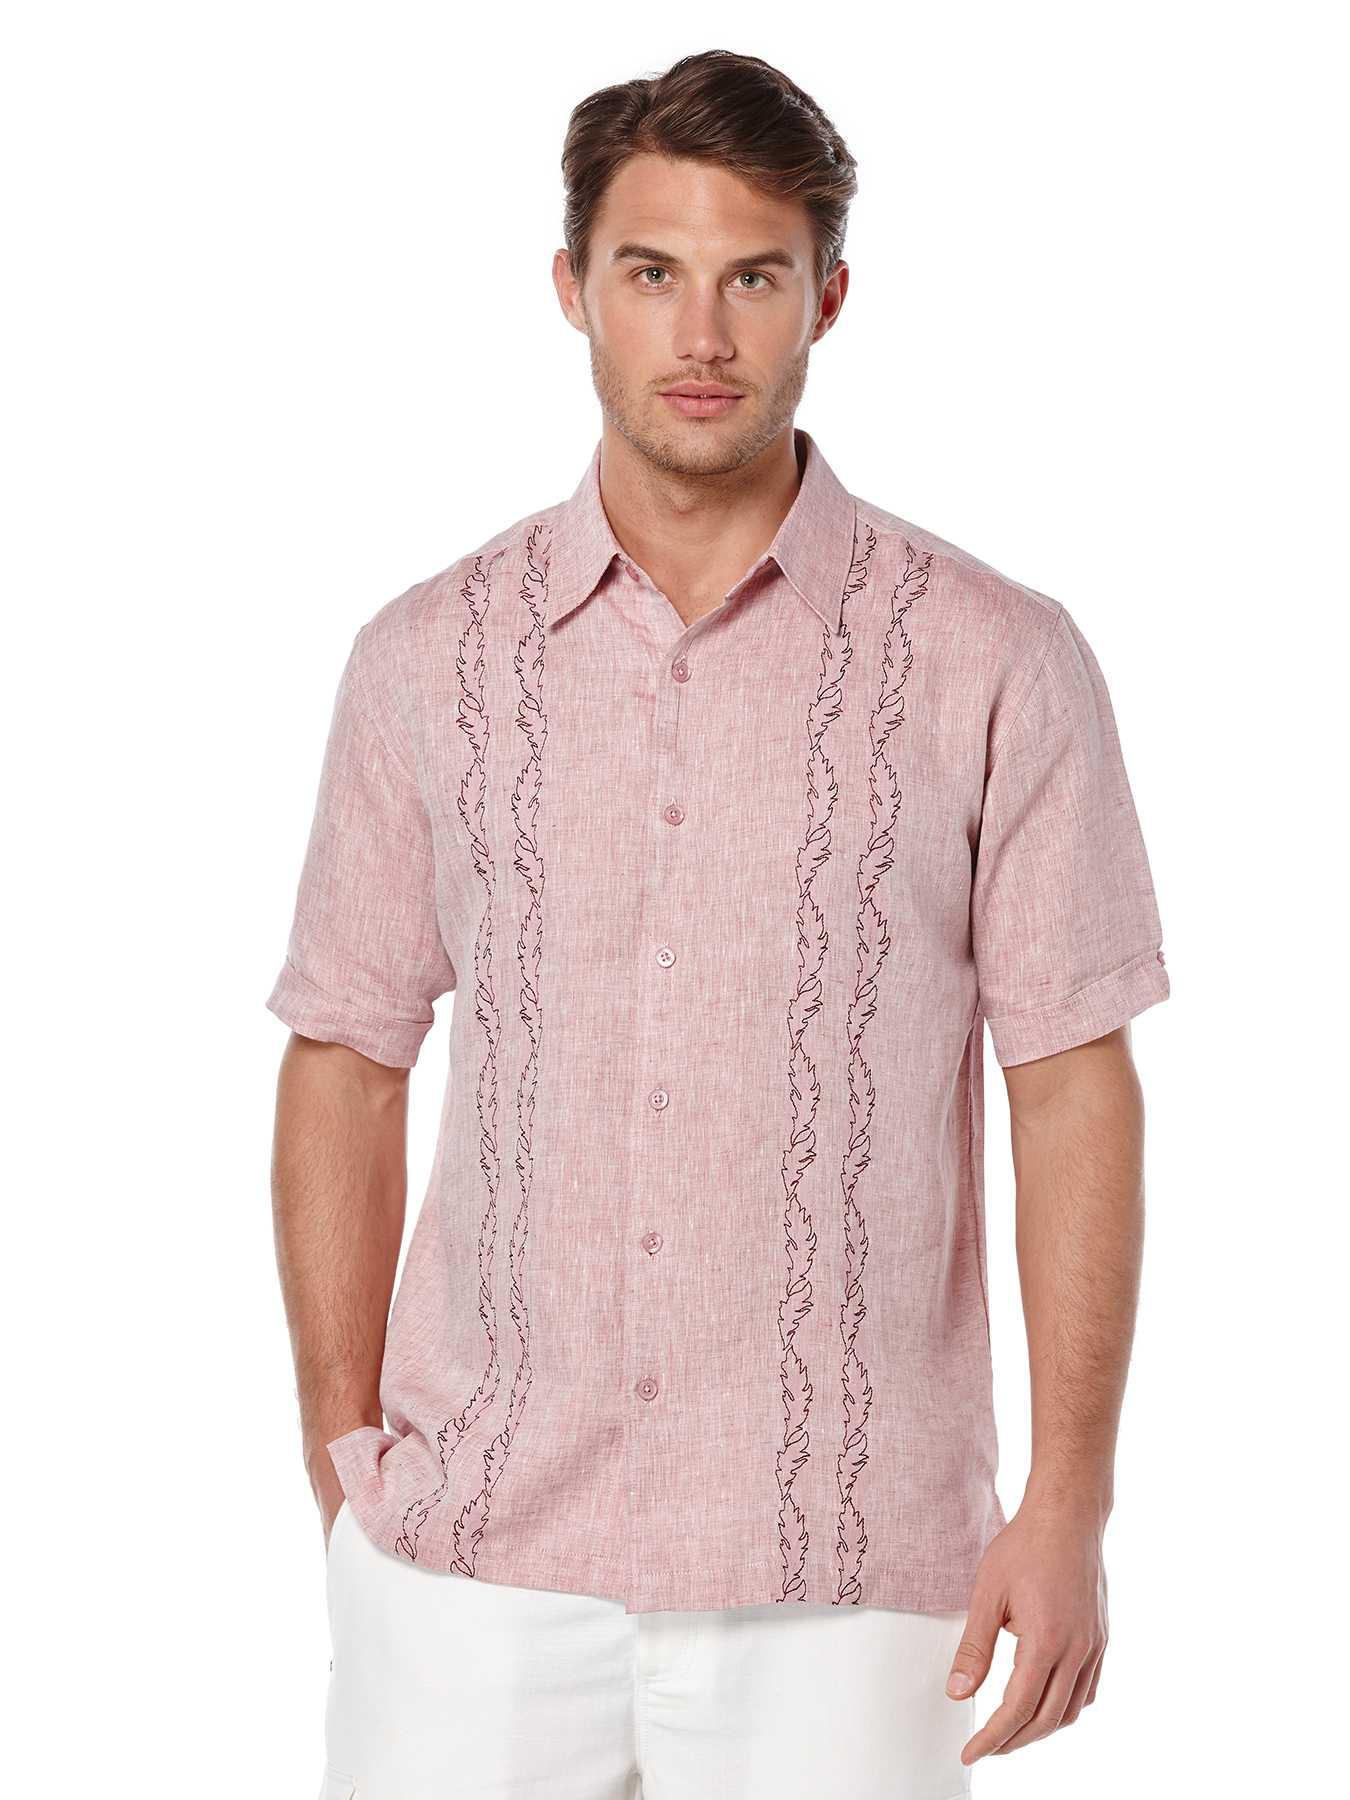 Cubavera Short Sleeve 100% Linen Print Embroidery